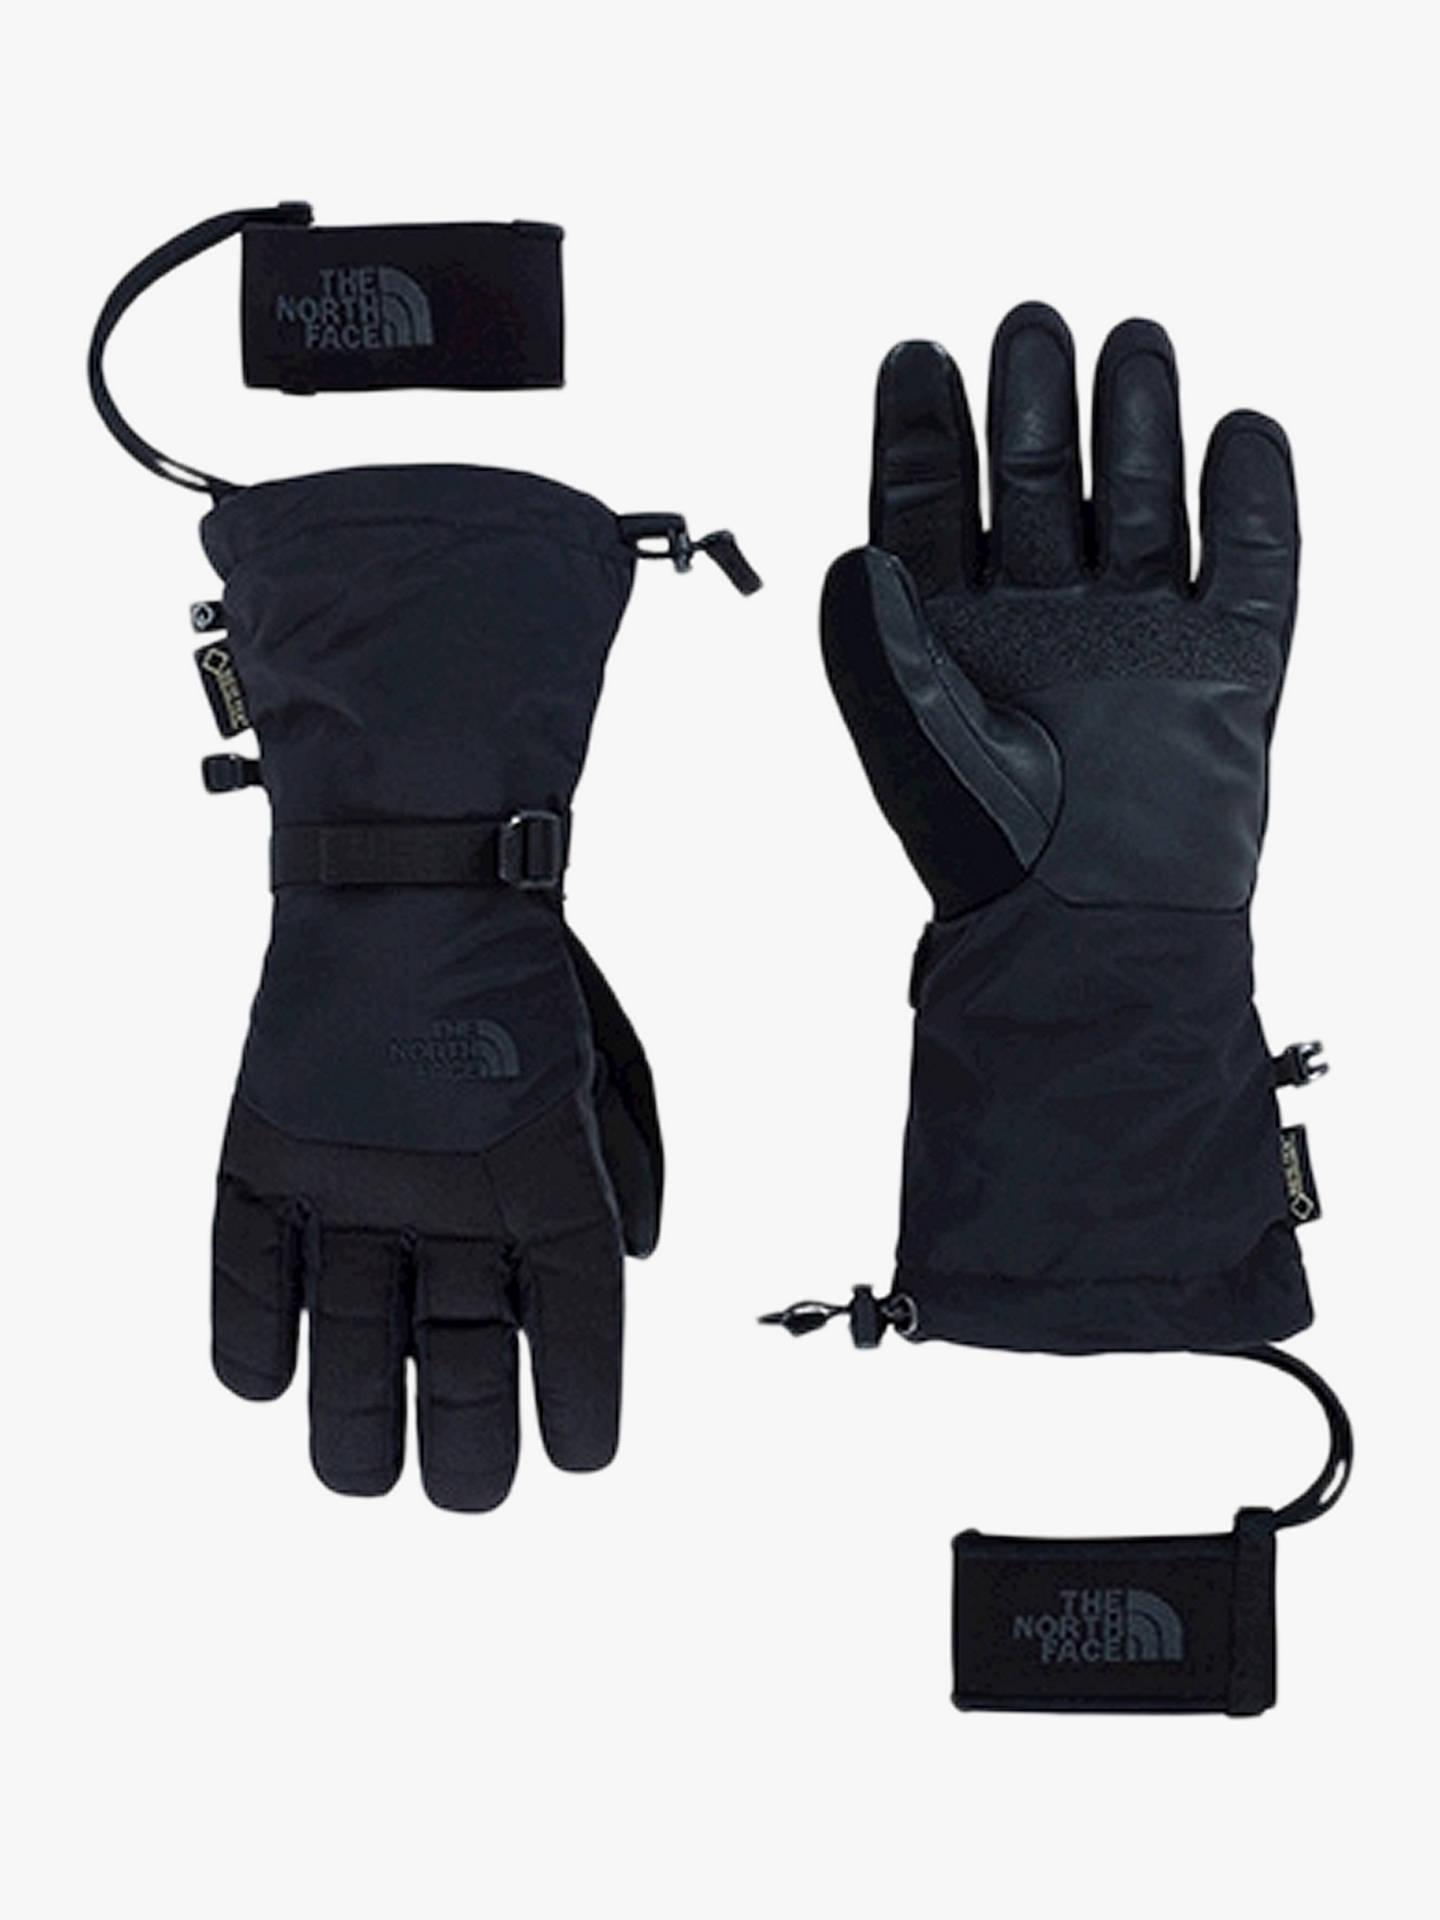 9f2df4778ddd7b The North Face Montana Etip Men's GORE-TEX Ski Gloves, Black at John ...